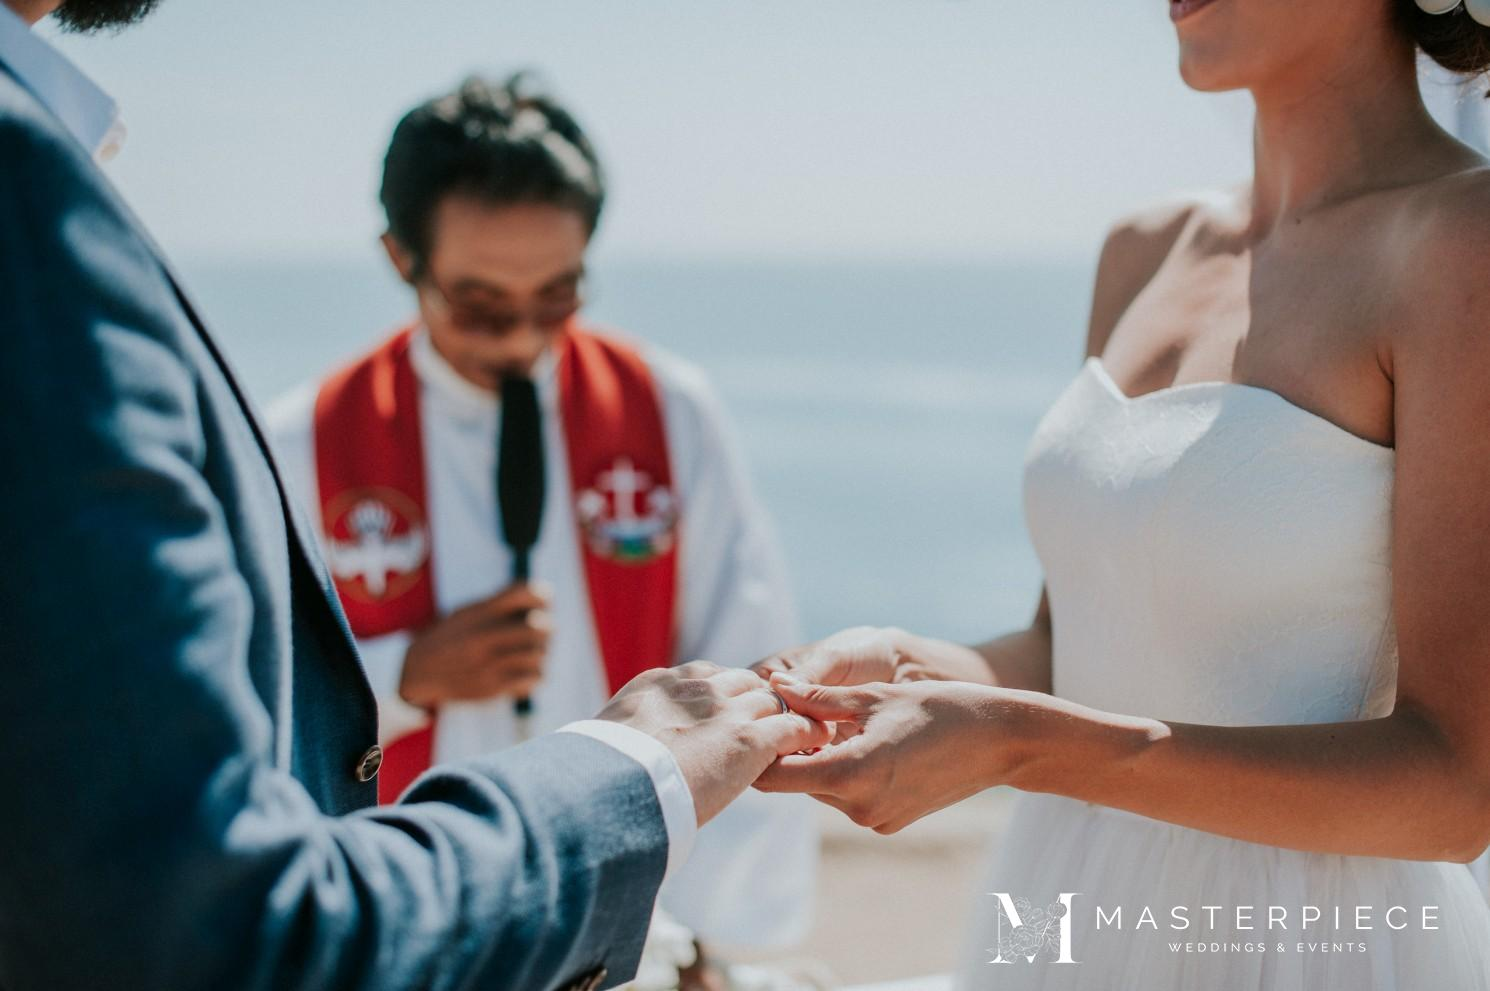 Masterpiece_Weddings_sluby_025